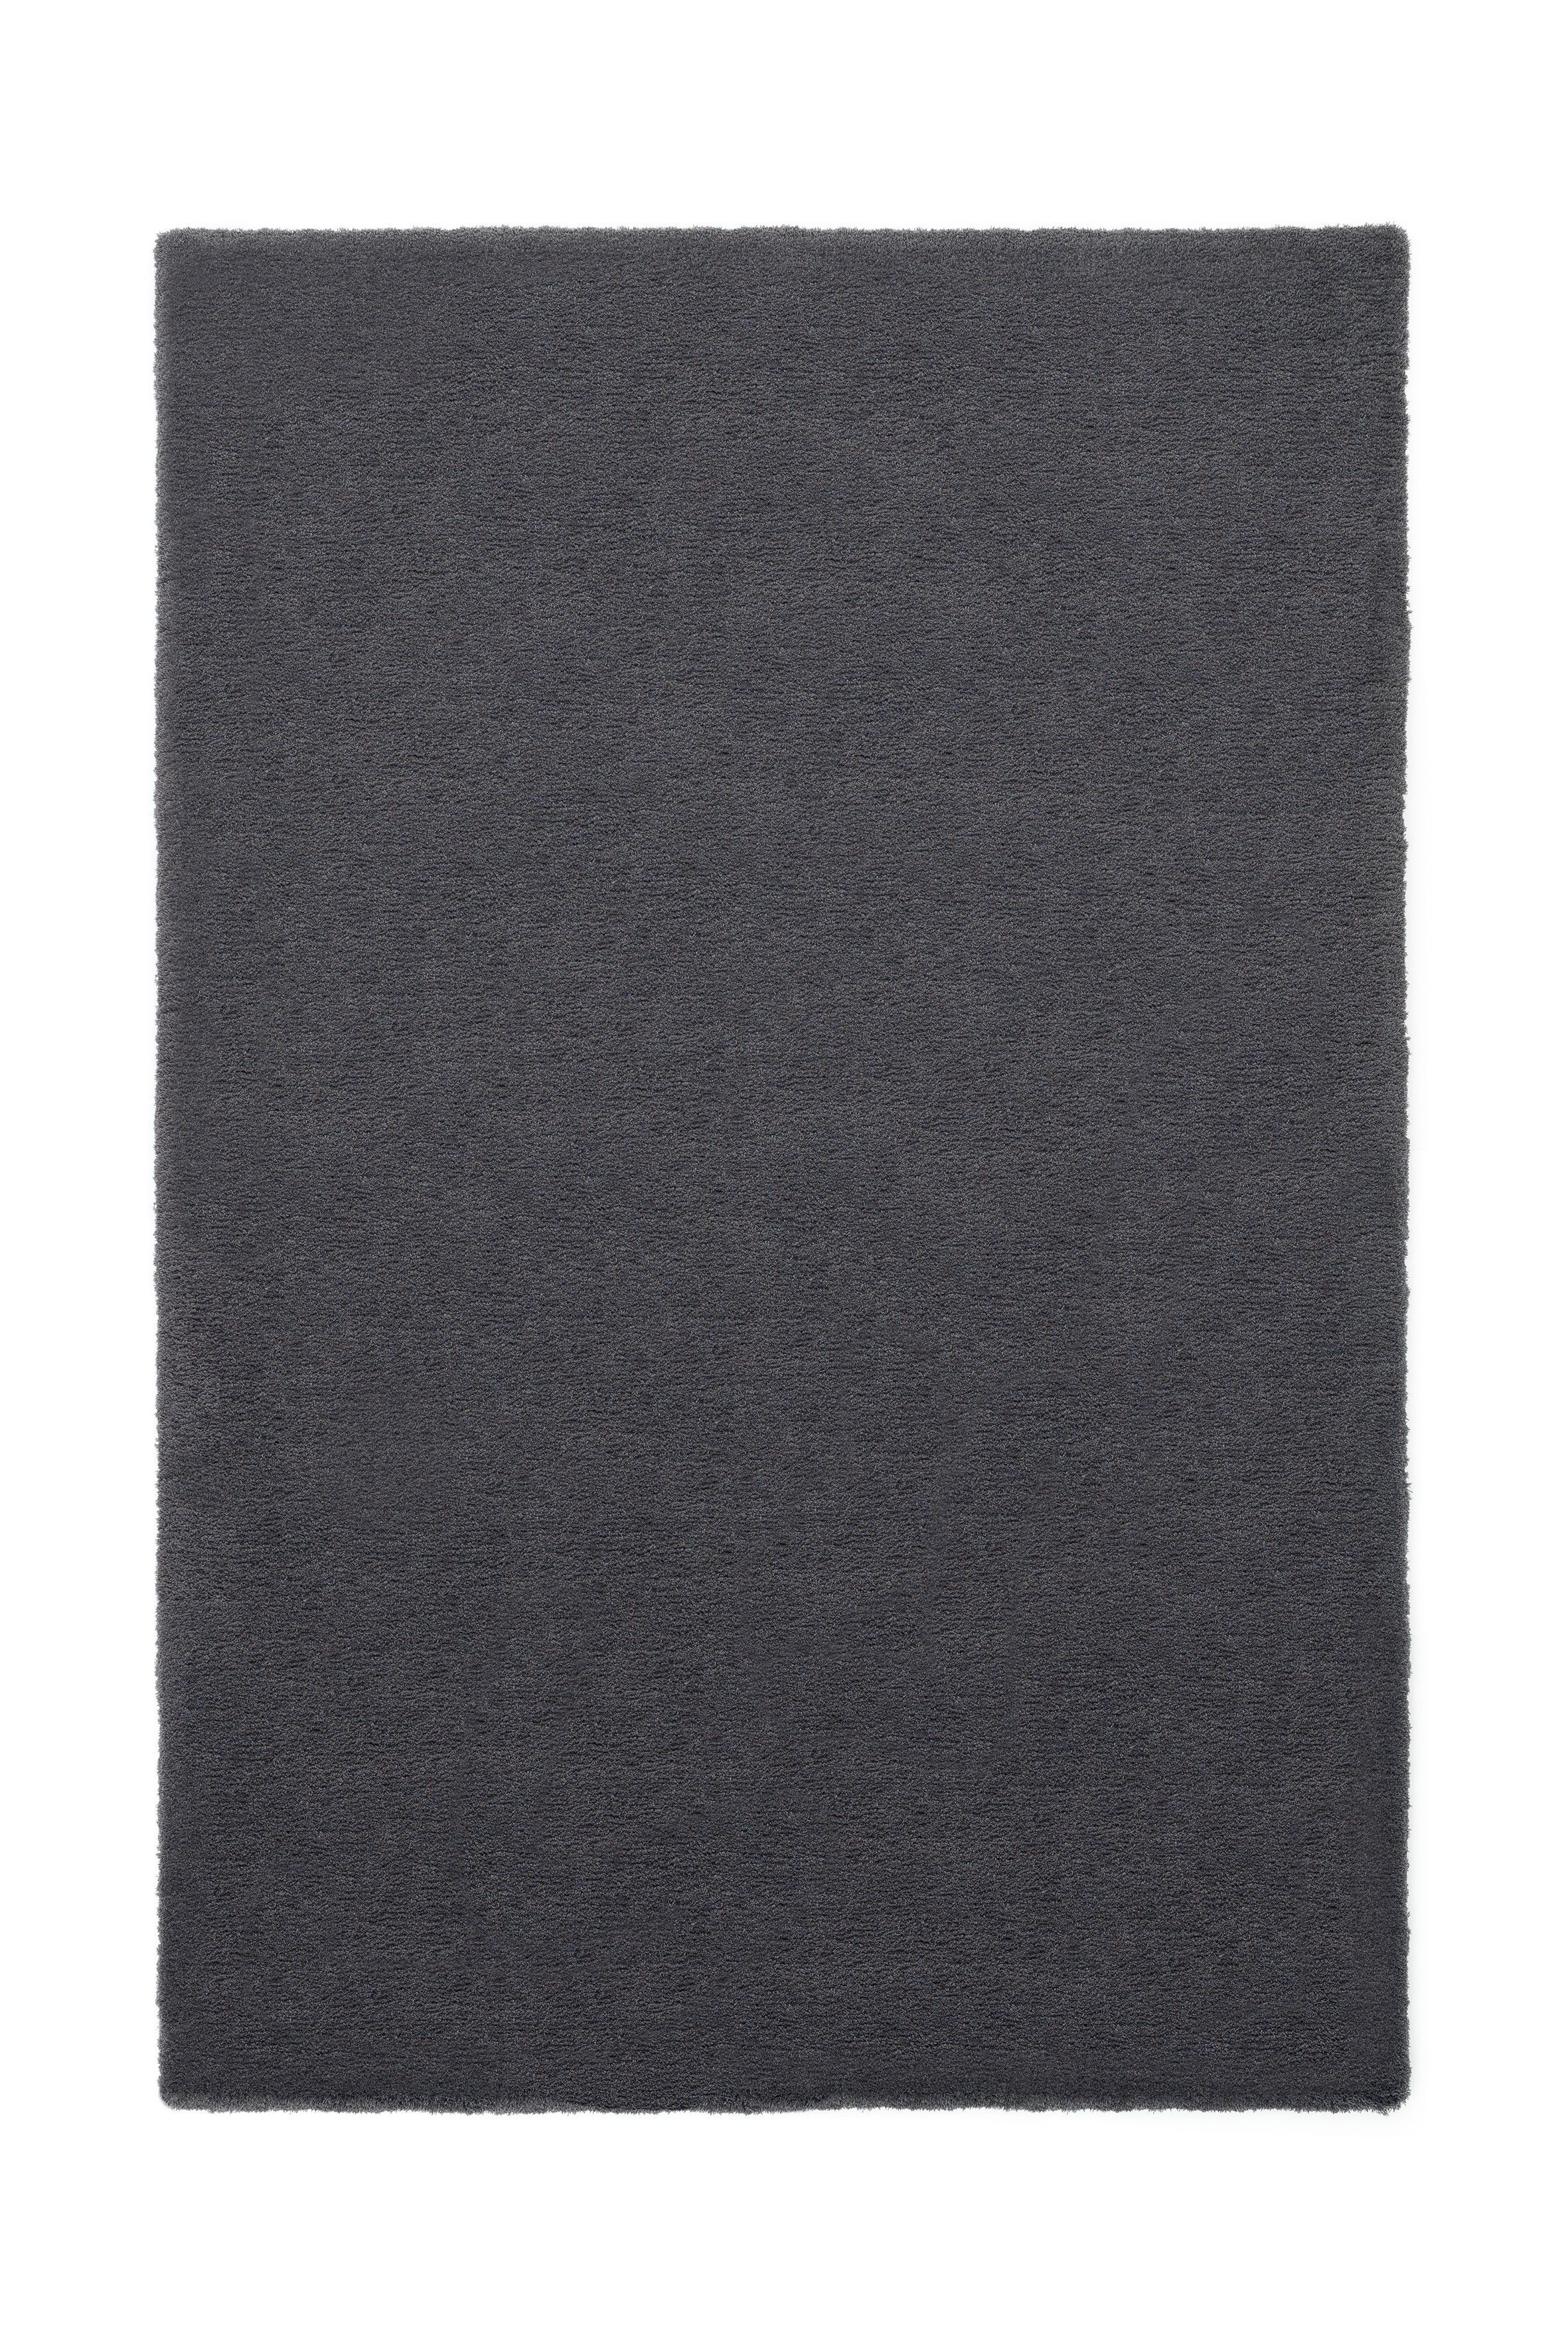 Astra - Golze koberce Kusový koberec Livorno 042 Dark Grey - 120x180 cm